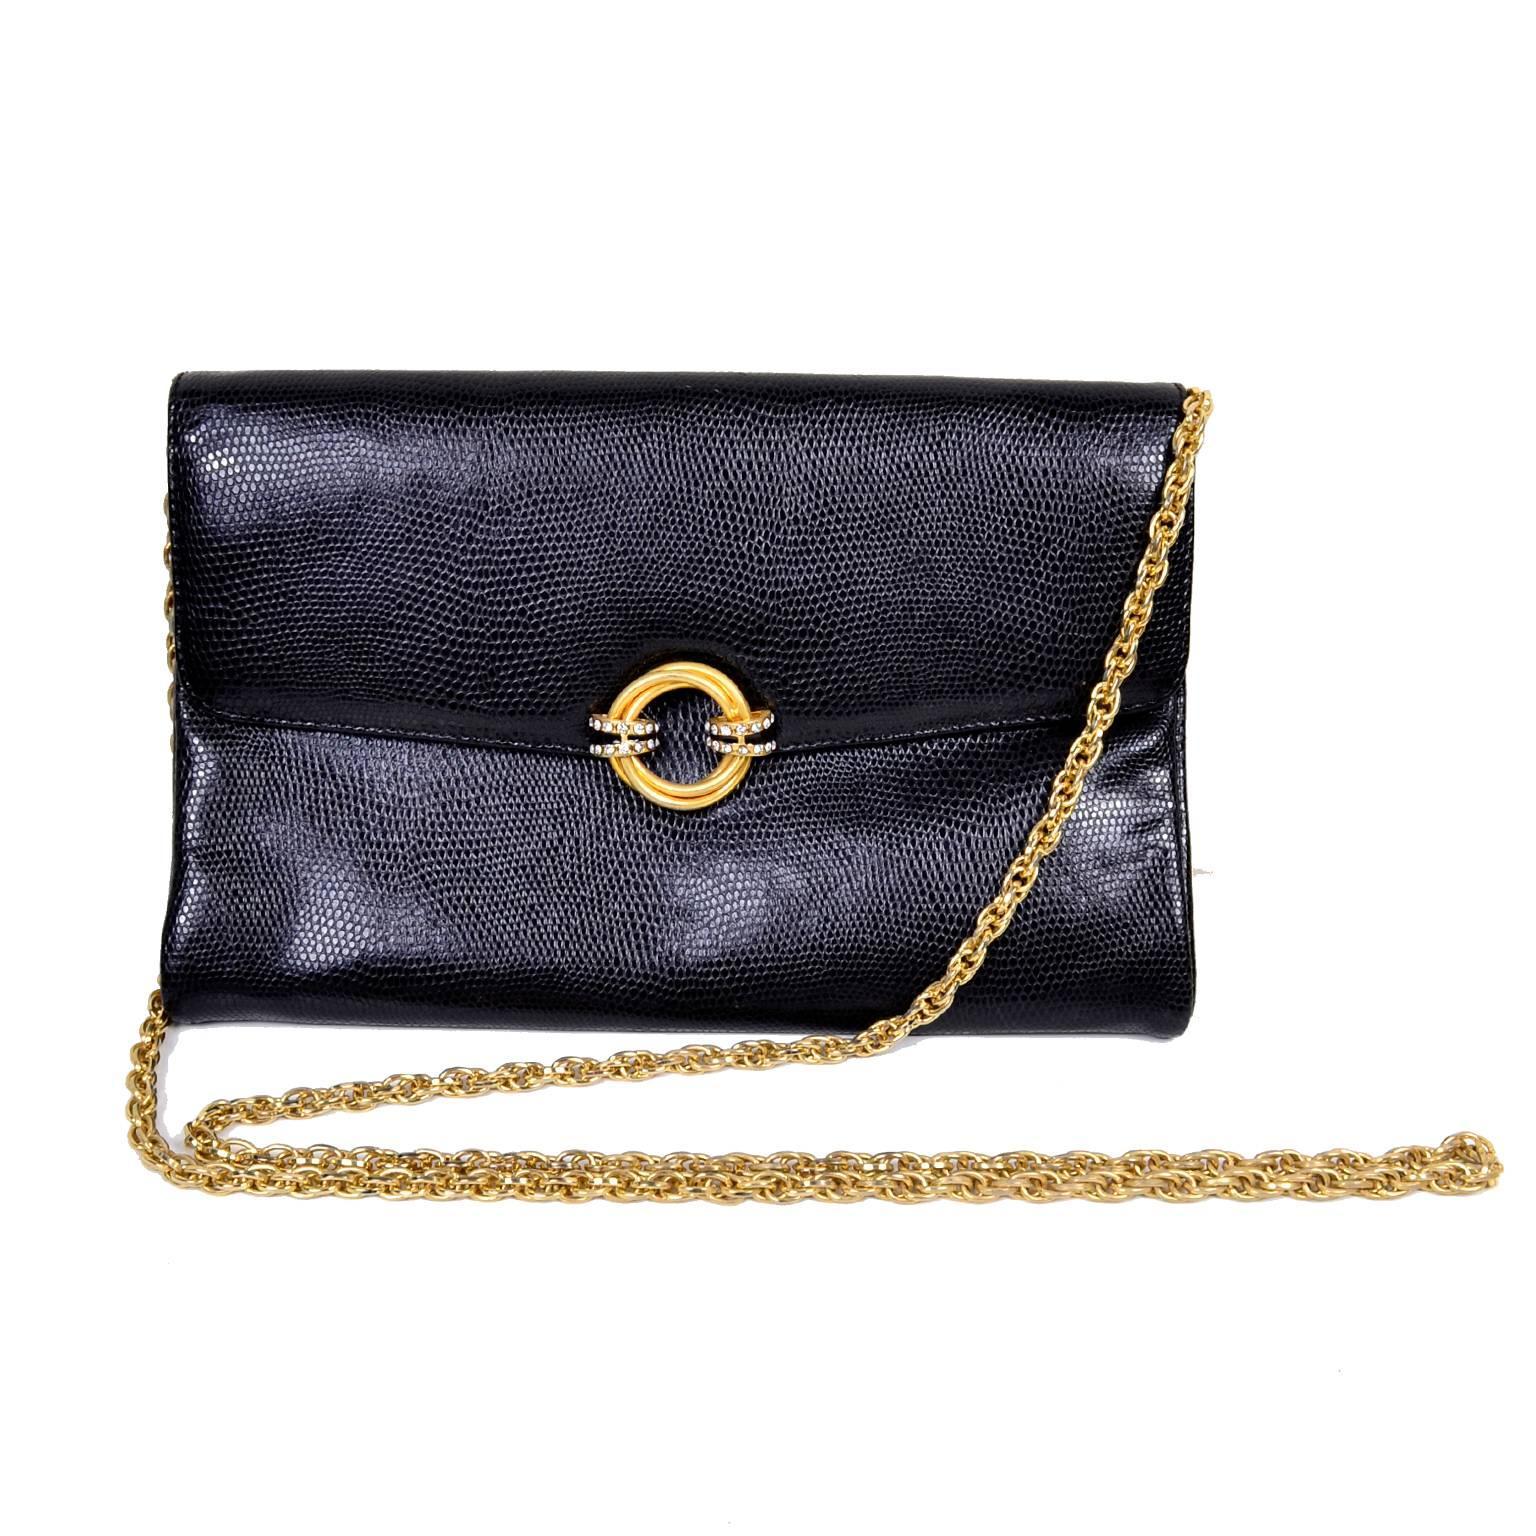 Rodo Italy Vintage Reptile Embossed Black Leather Handbag W/ Rhinestone Clasp RHdj2Ht